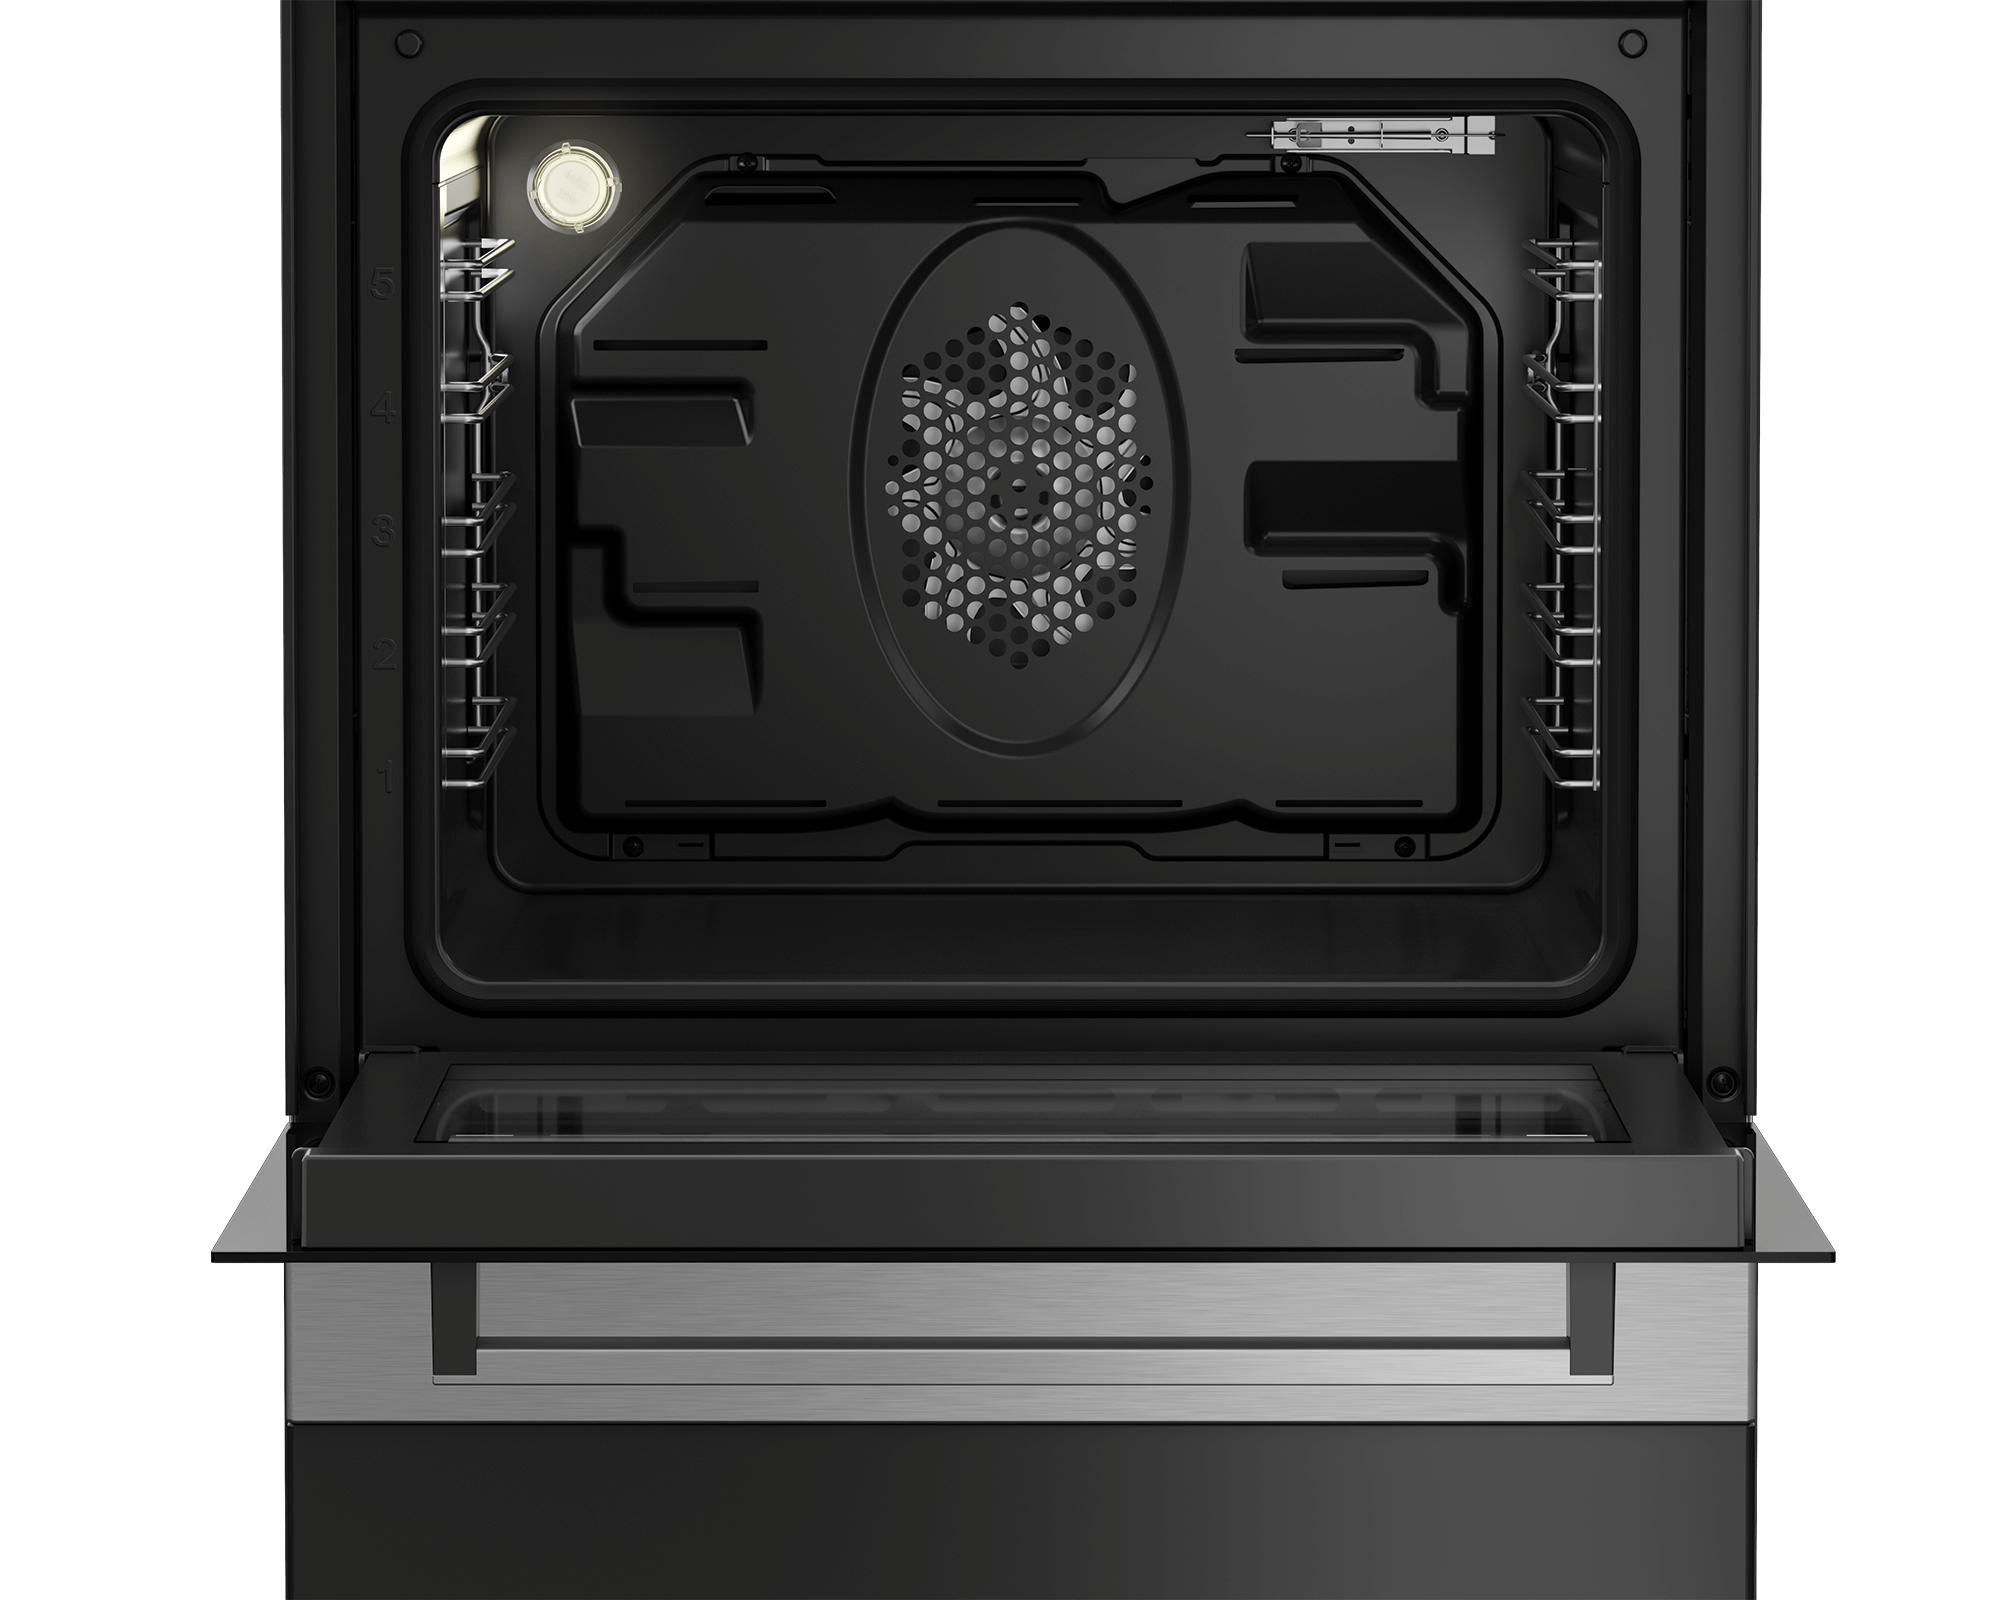 BEKO 60cm Electric Cooker FSM67320GXS